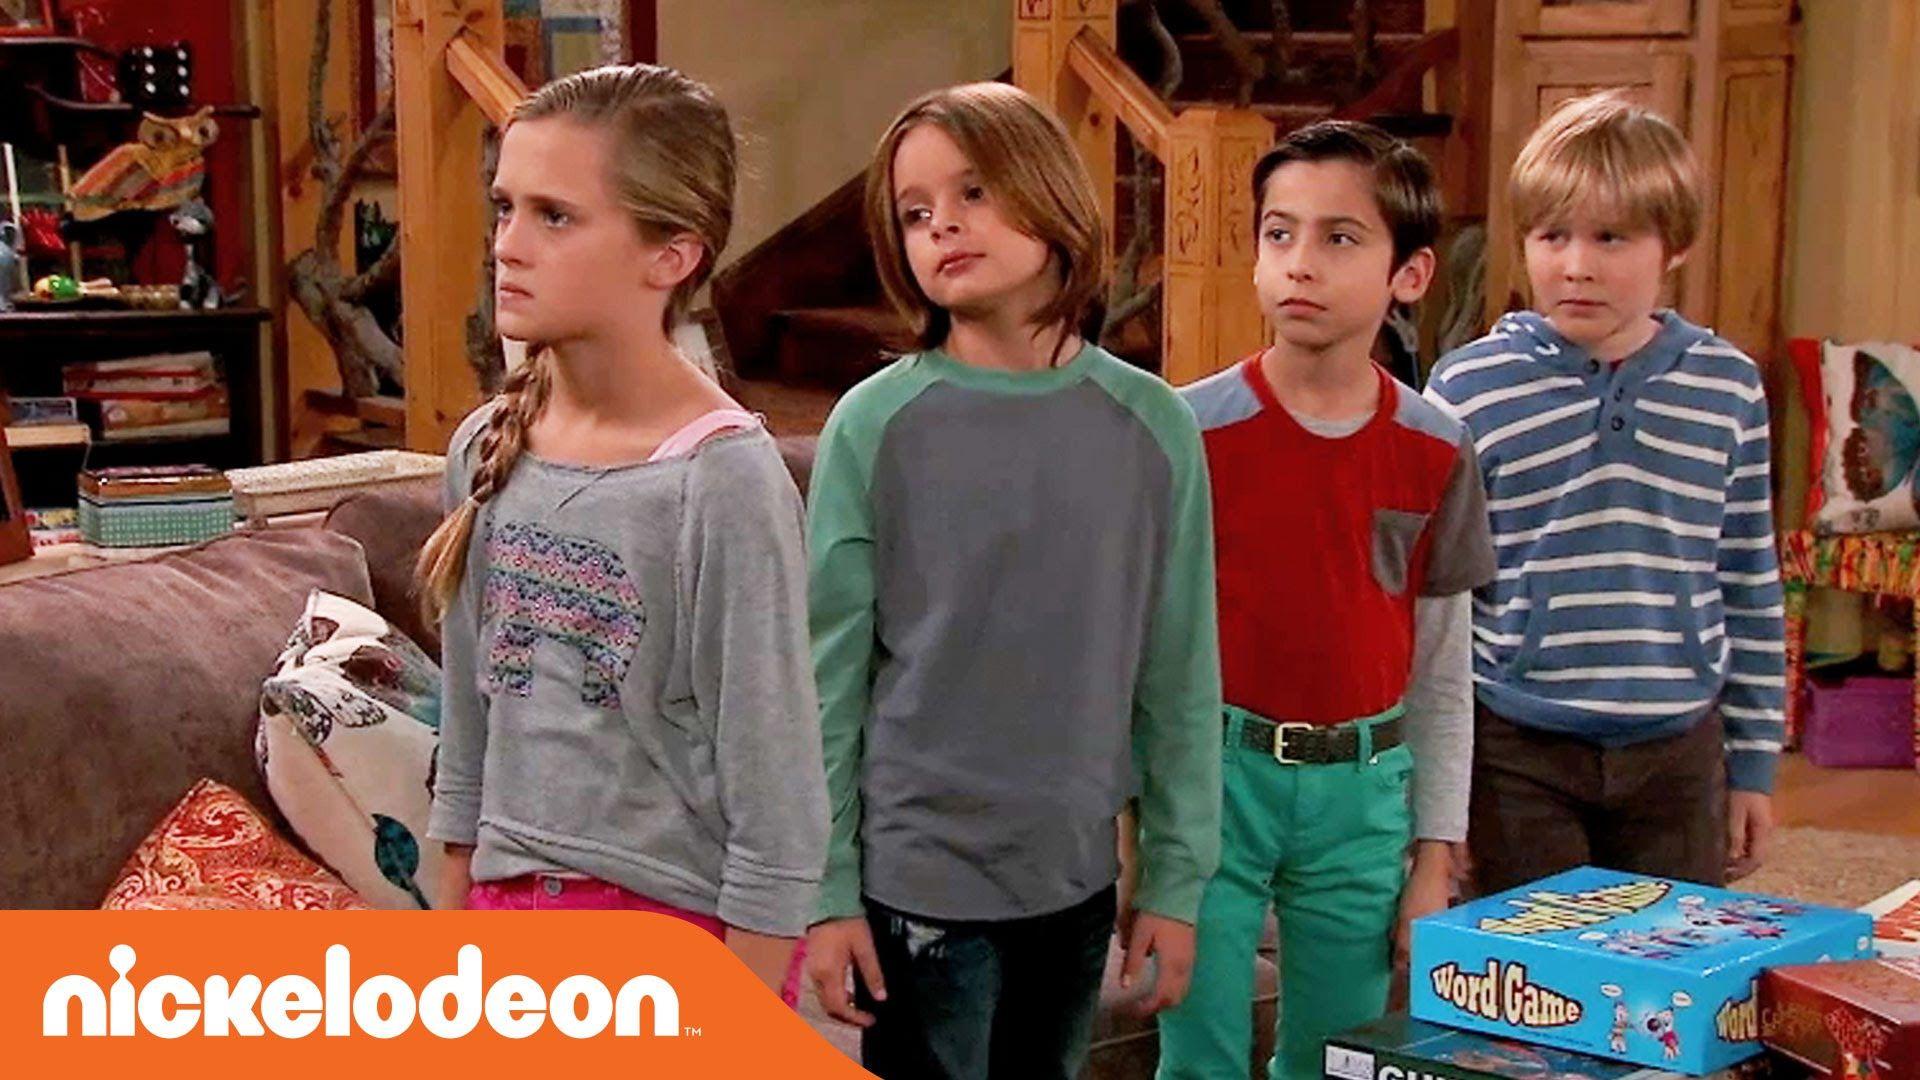 Nicky-Ricky-Dicky-Dawn-TV-show-on-Nickelodeon-season-3-renewal.jpg (1920×1080)